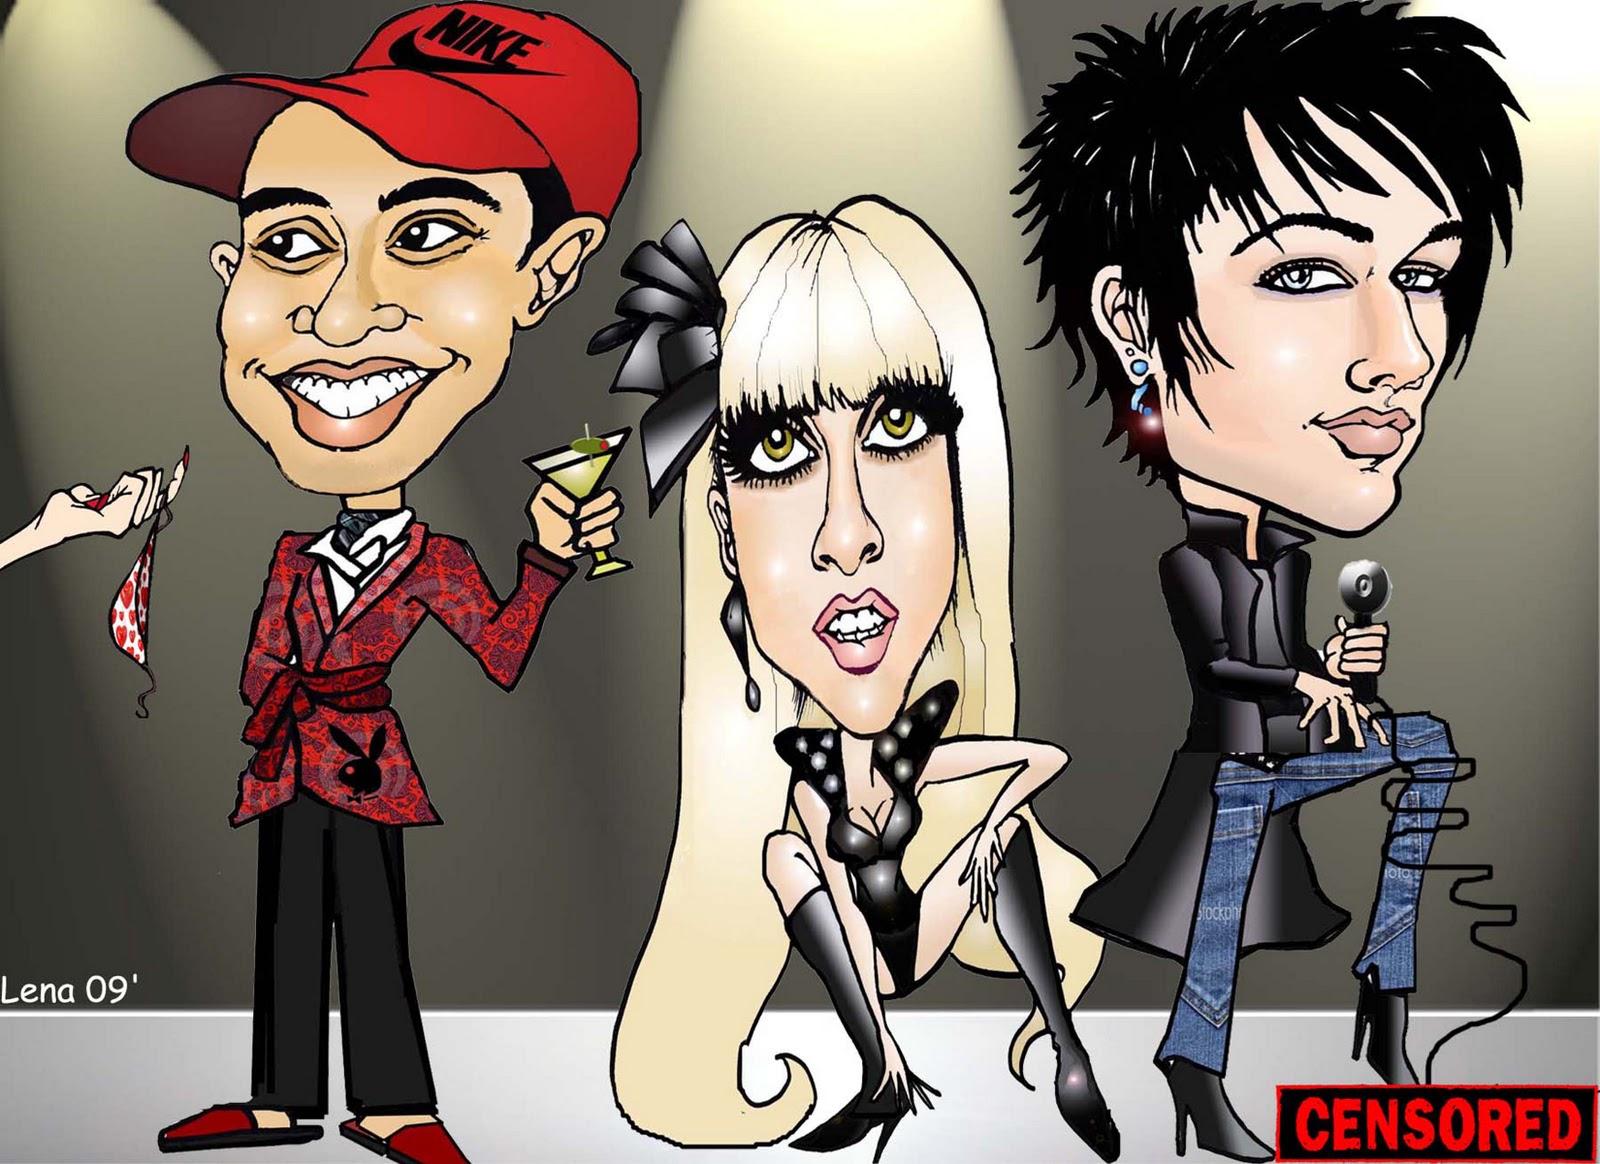 http://1.bp.blogspot.com/-nQ1U_F53UHg/TVNpN2w-UFI/AAAAAAAAA88/3N7RJGR4DJg/s1600/Spotlight+Hogs+%2528+Tiger%252C+Gaga%252C+Lambert%2529.jpg